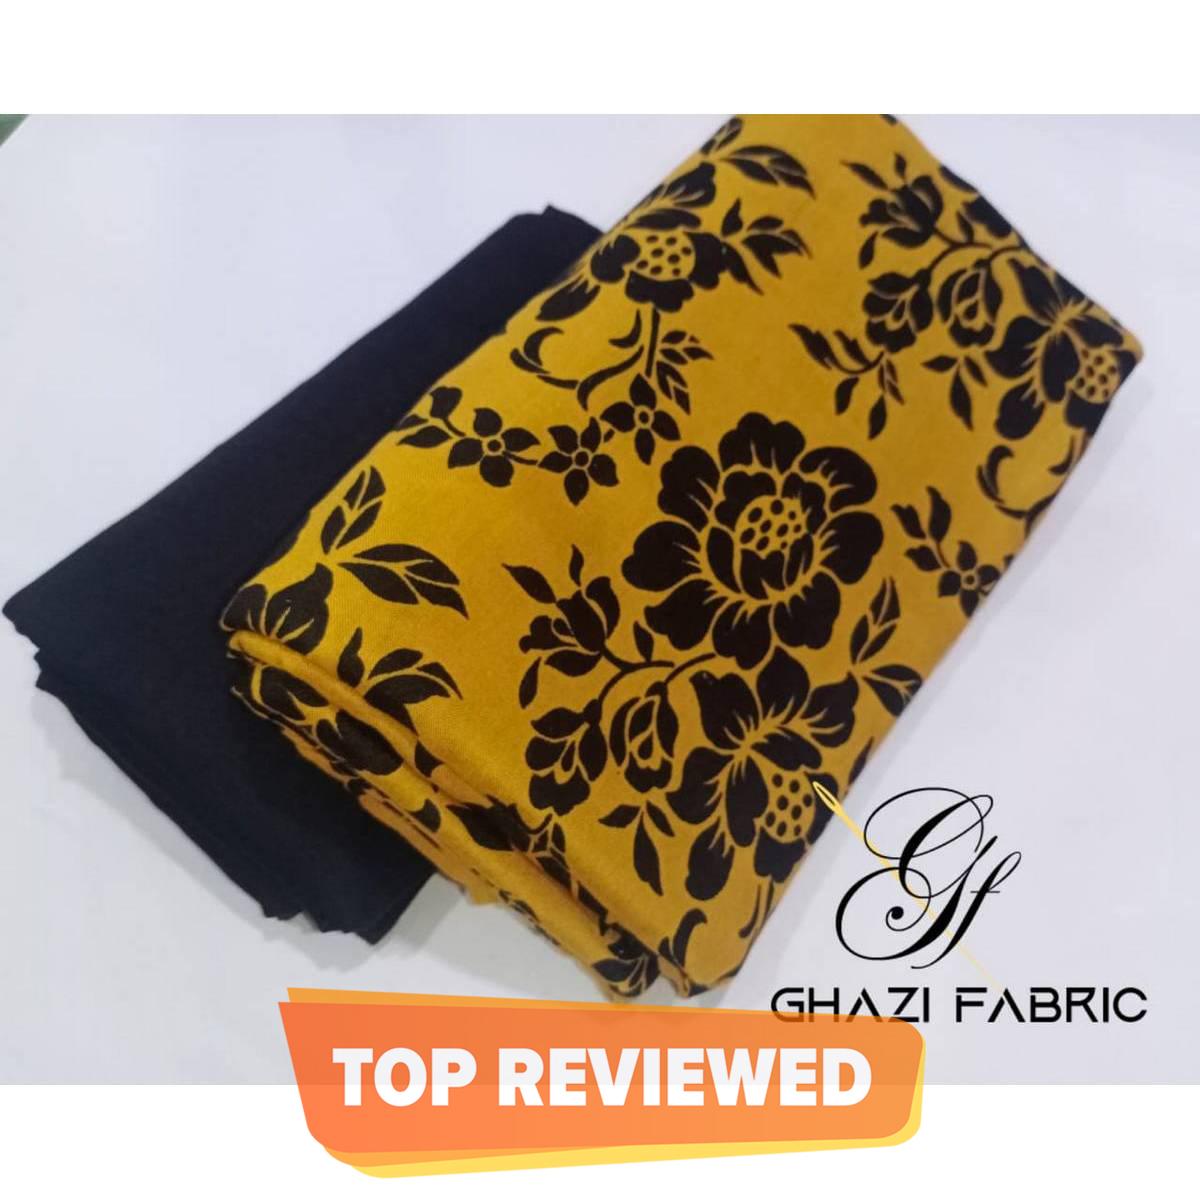 High Demand  Unstich Linen Fabric New design  printed shirt & plain trouser fabric New Linen Collection product of Ghazi Fabric